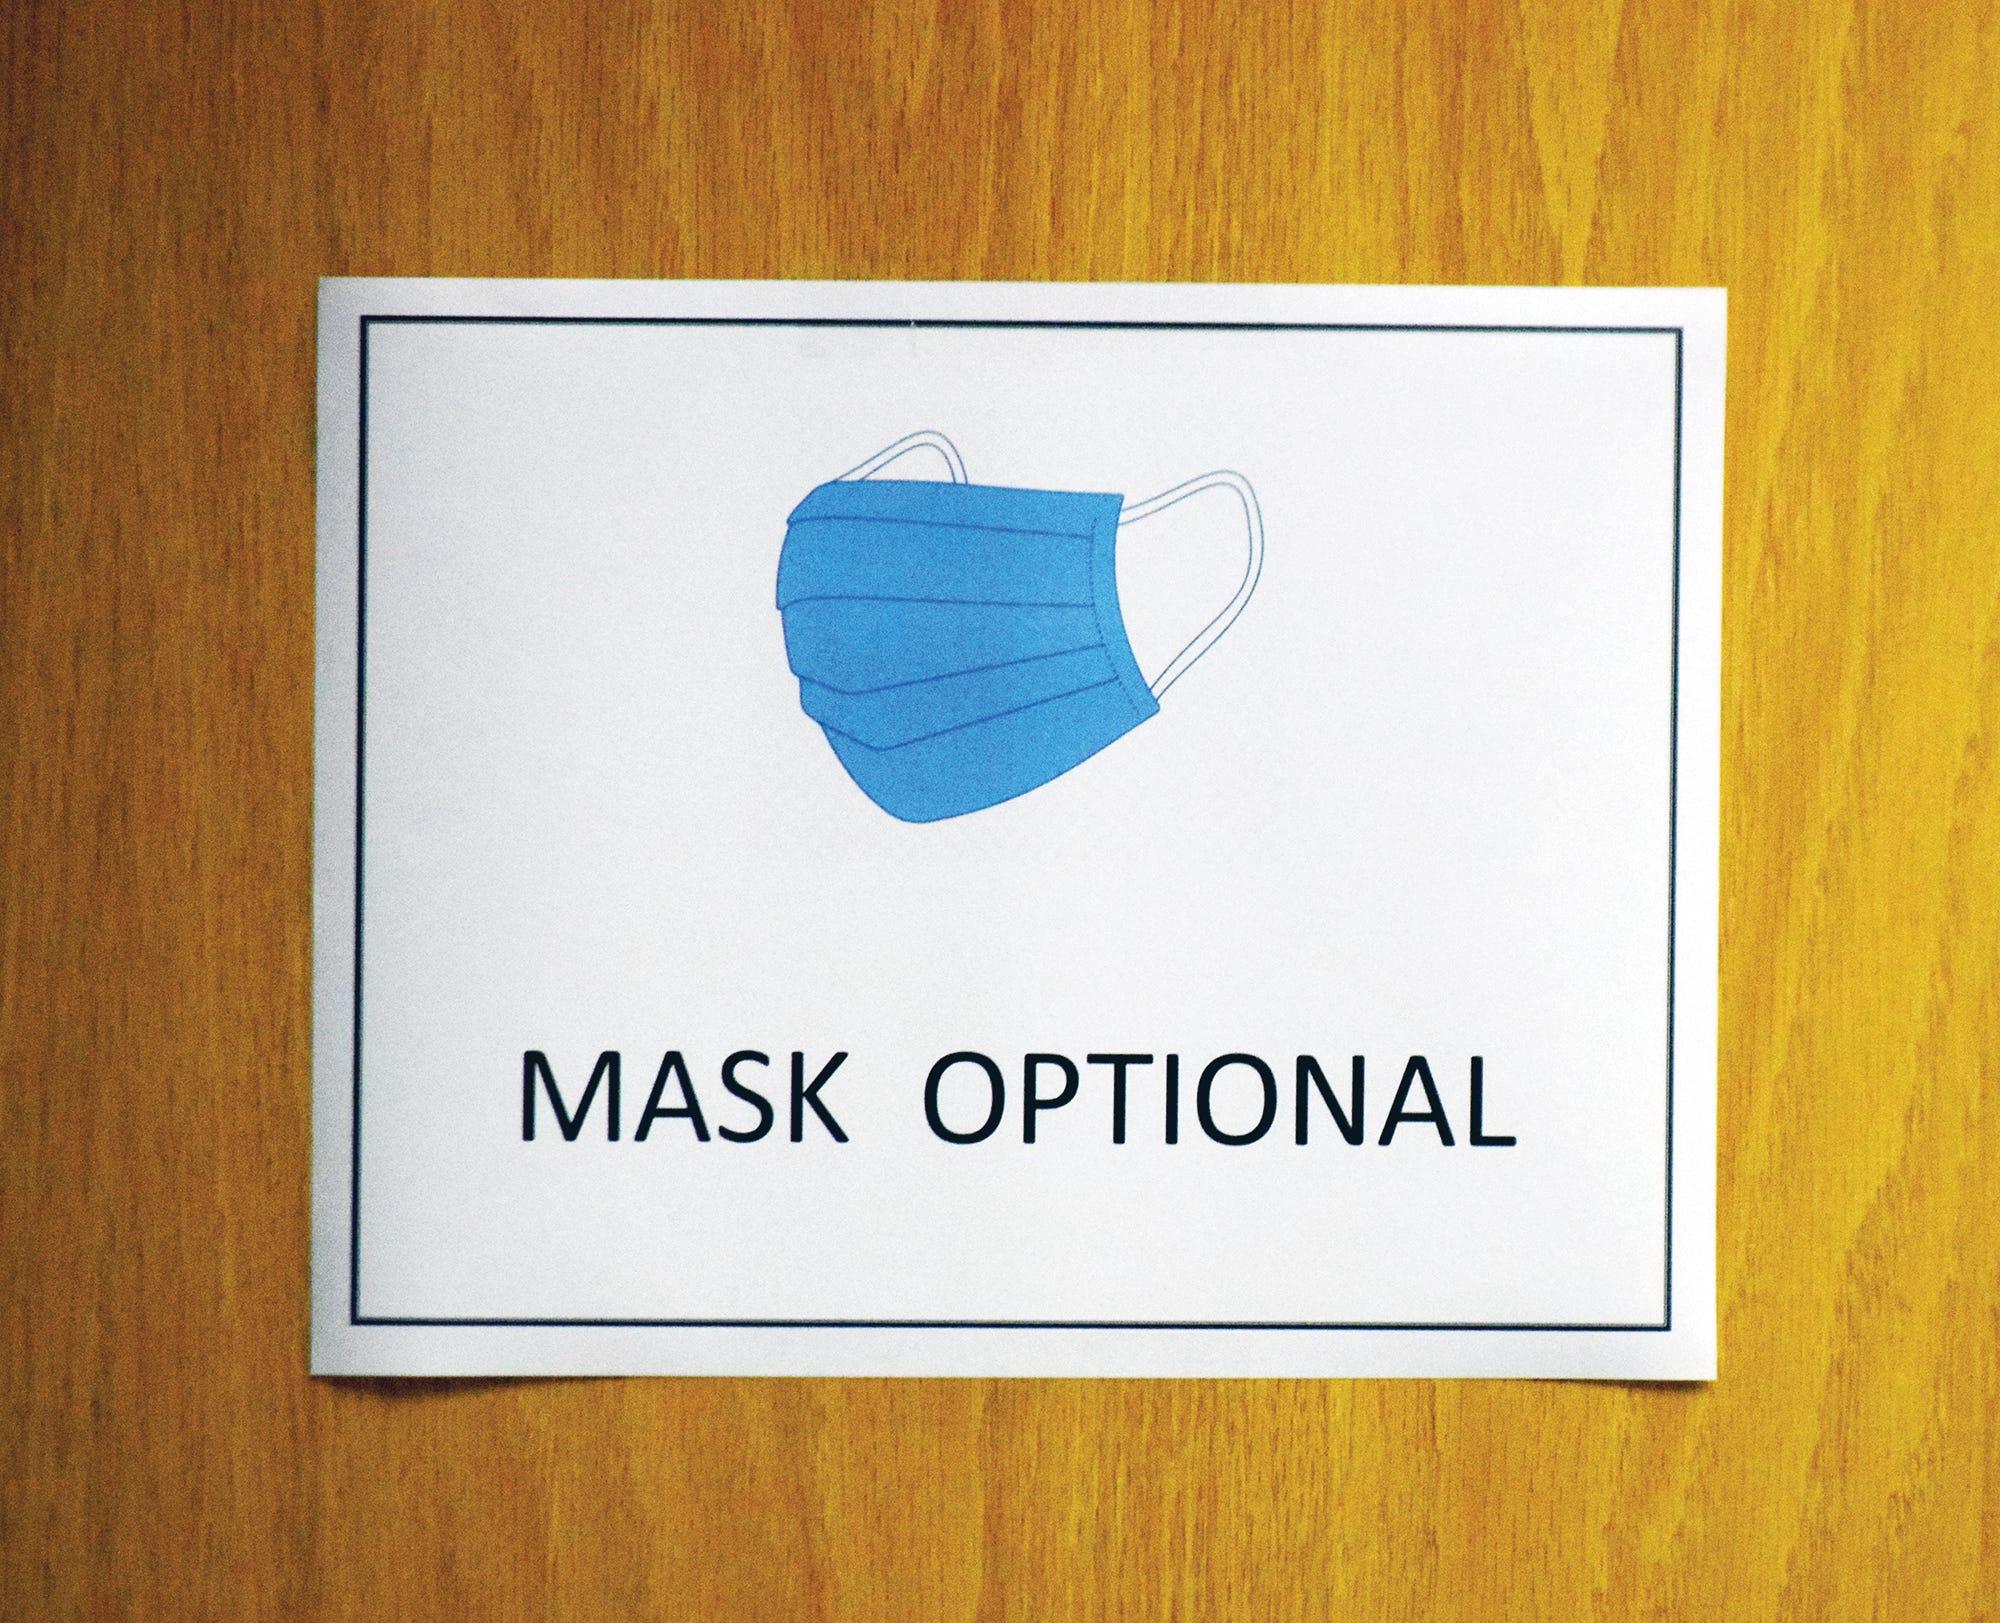 ocala news, ocala post, mask optional